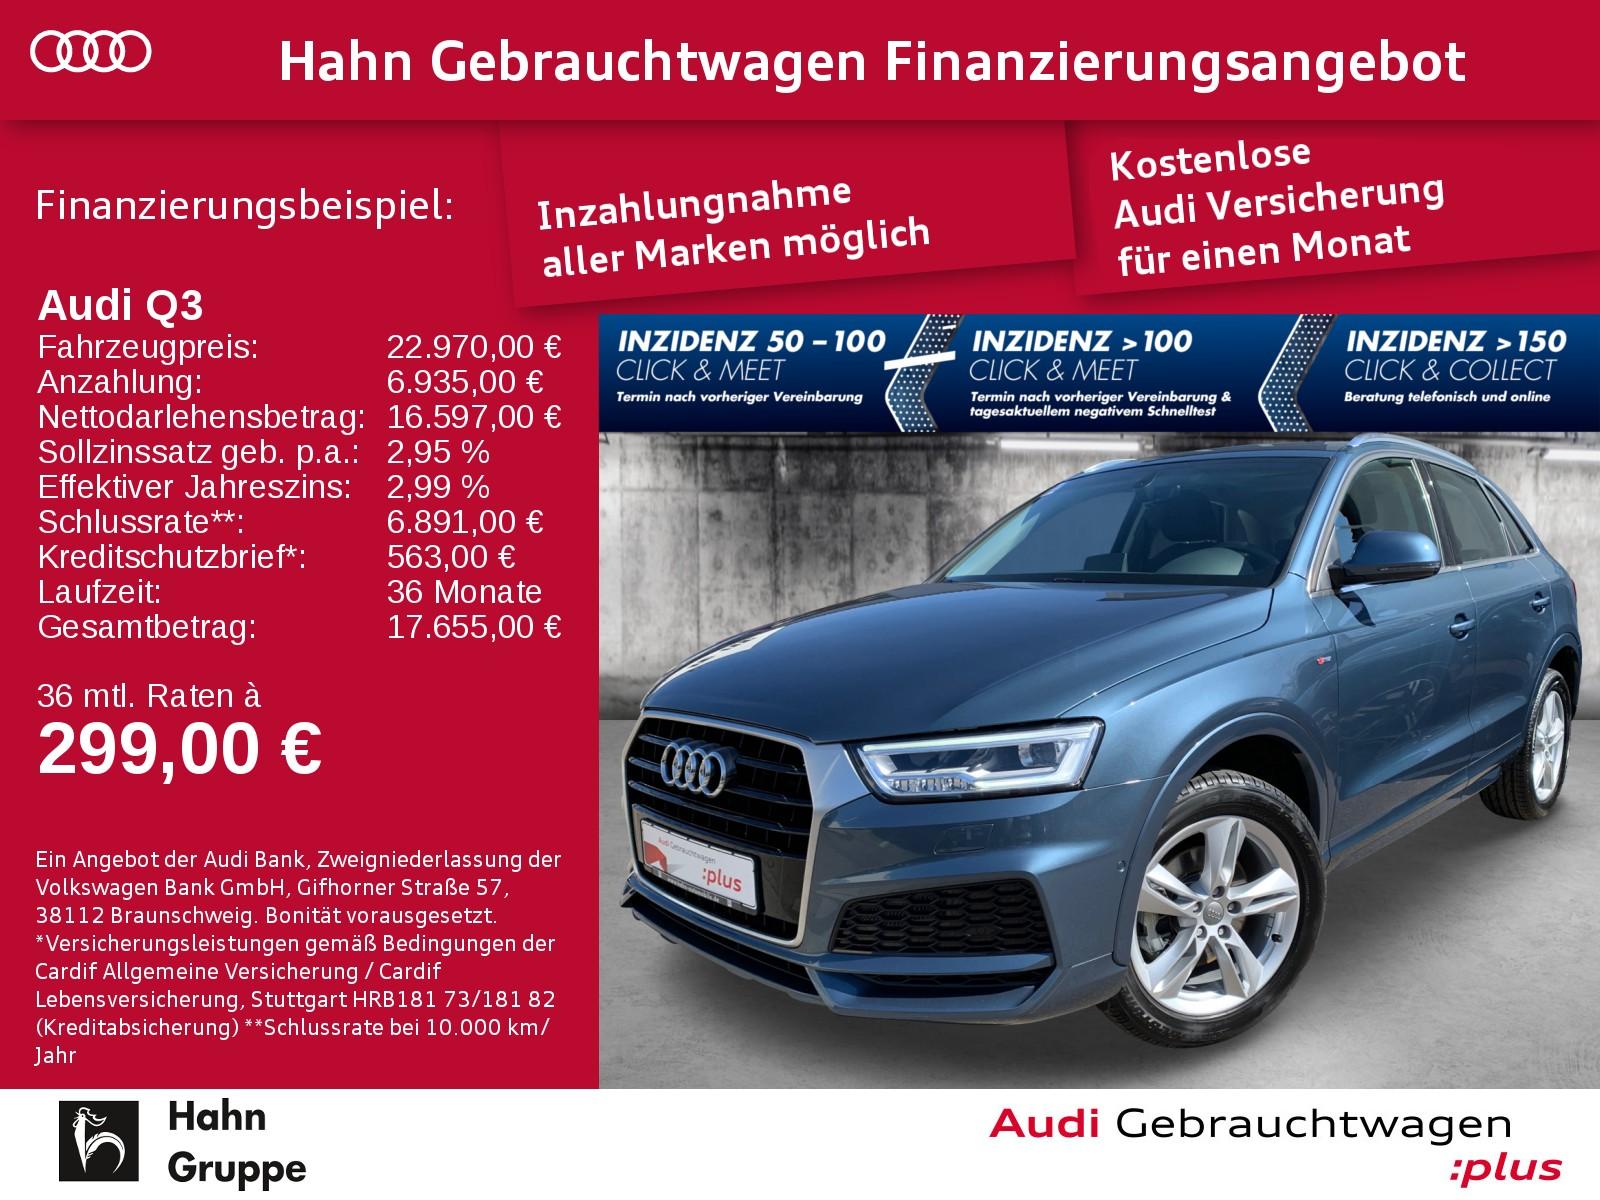 Audi Q3 2.0 TDI S-trc S-line Navi LED Pano Sitzh, Jahr 2018, Diesel